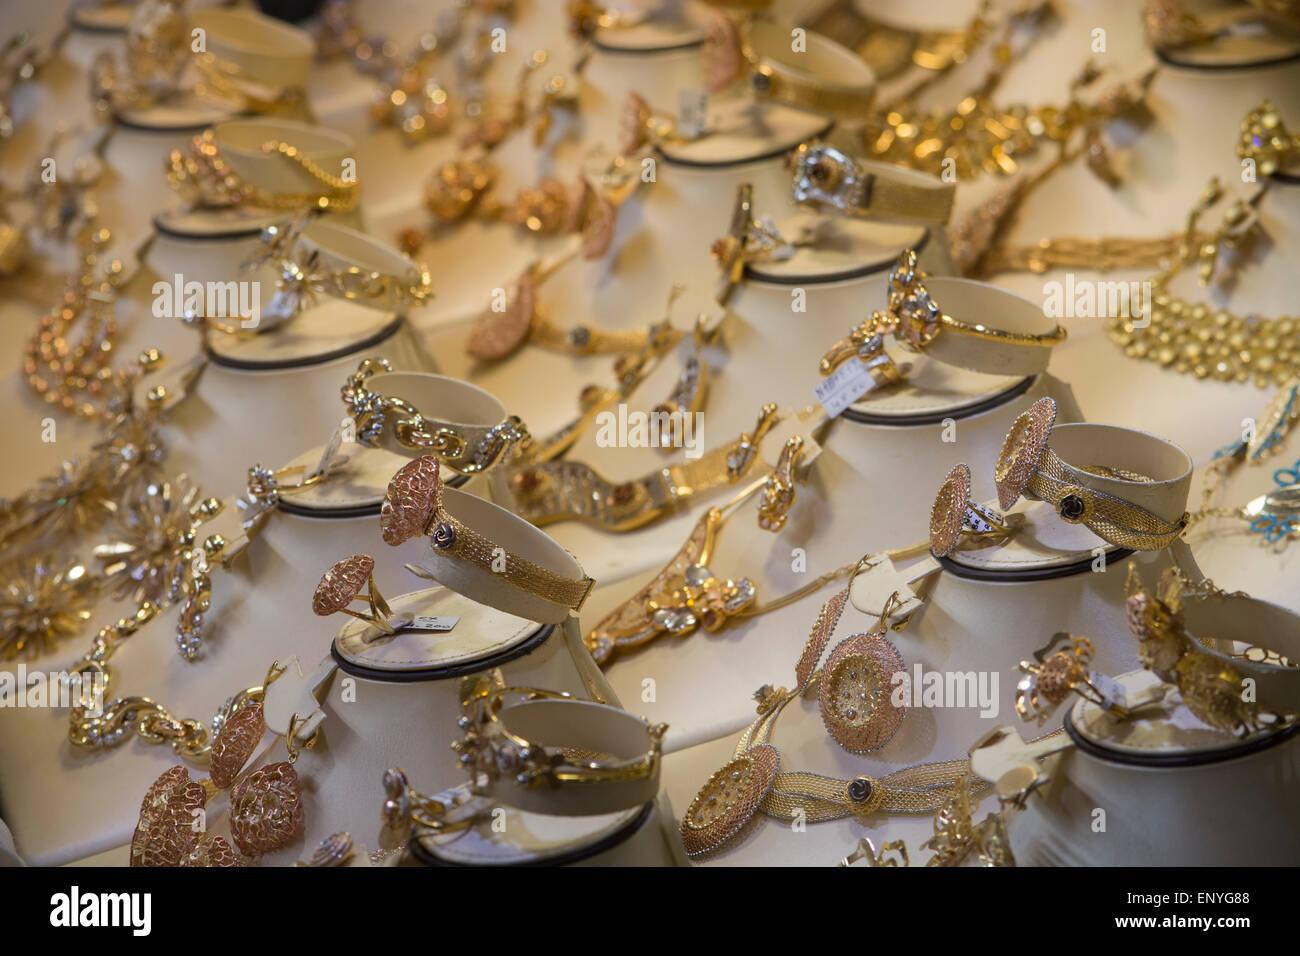 United Arab Emirates, Dubai, Deira district, Gold Souk window display. - Stock Image